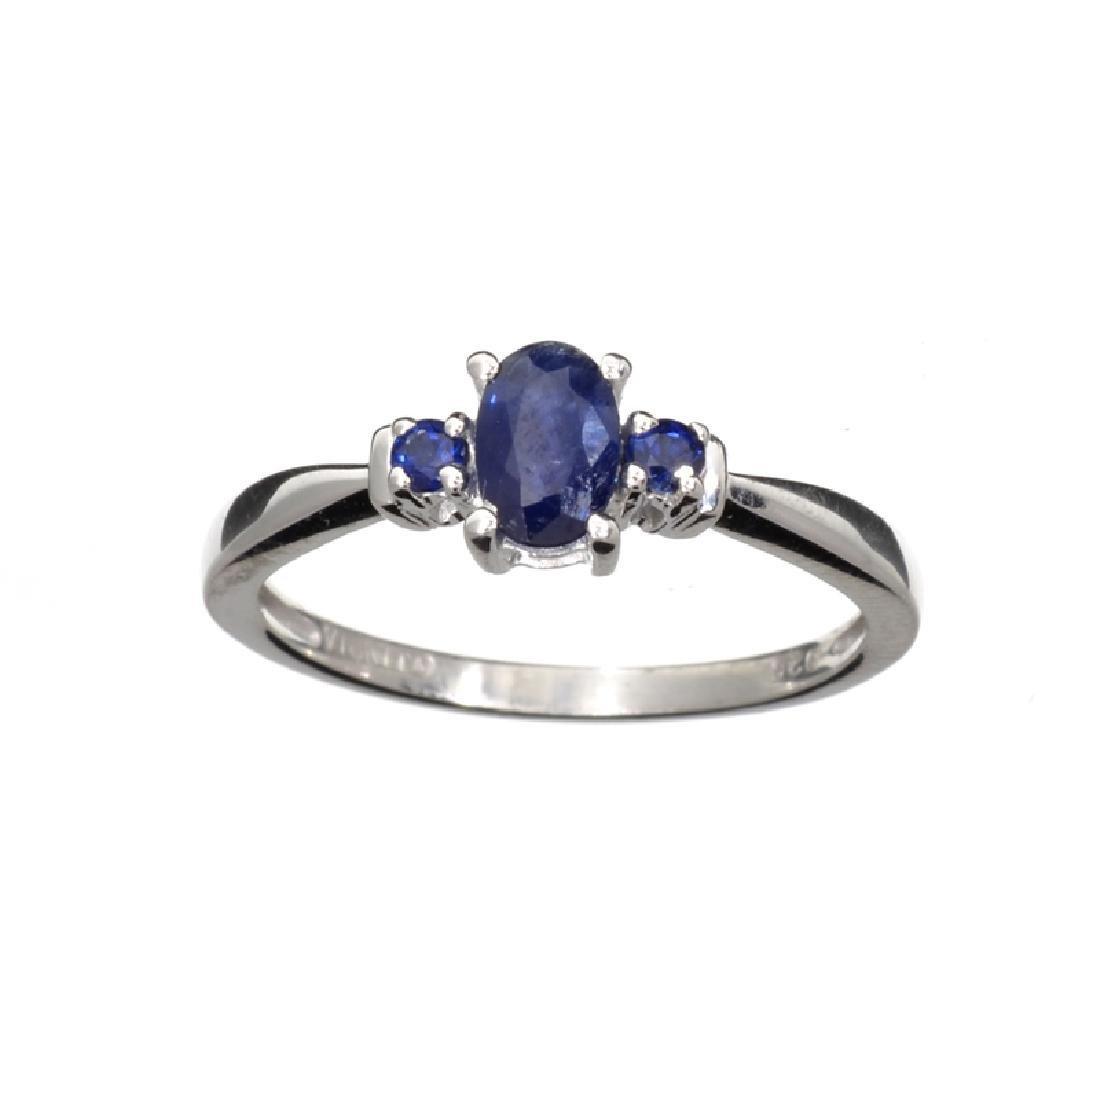 APP: 0.5k Fine Jewelry 0.75CT Oval Cut Blue Sapphire